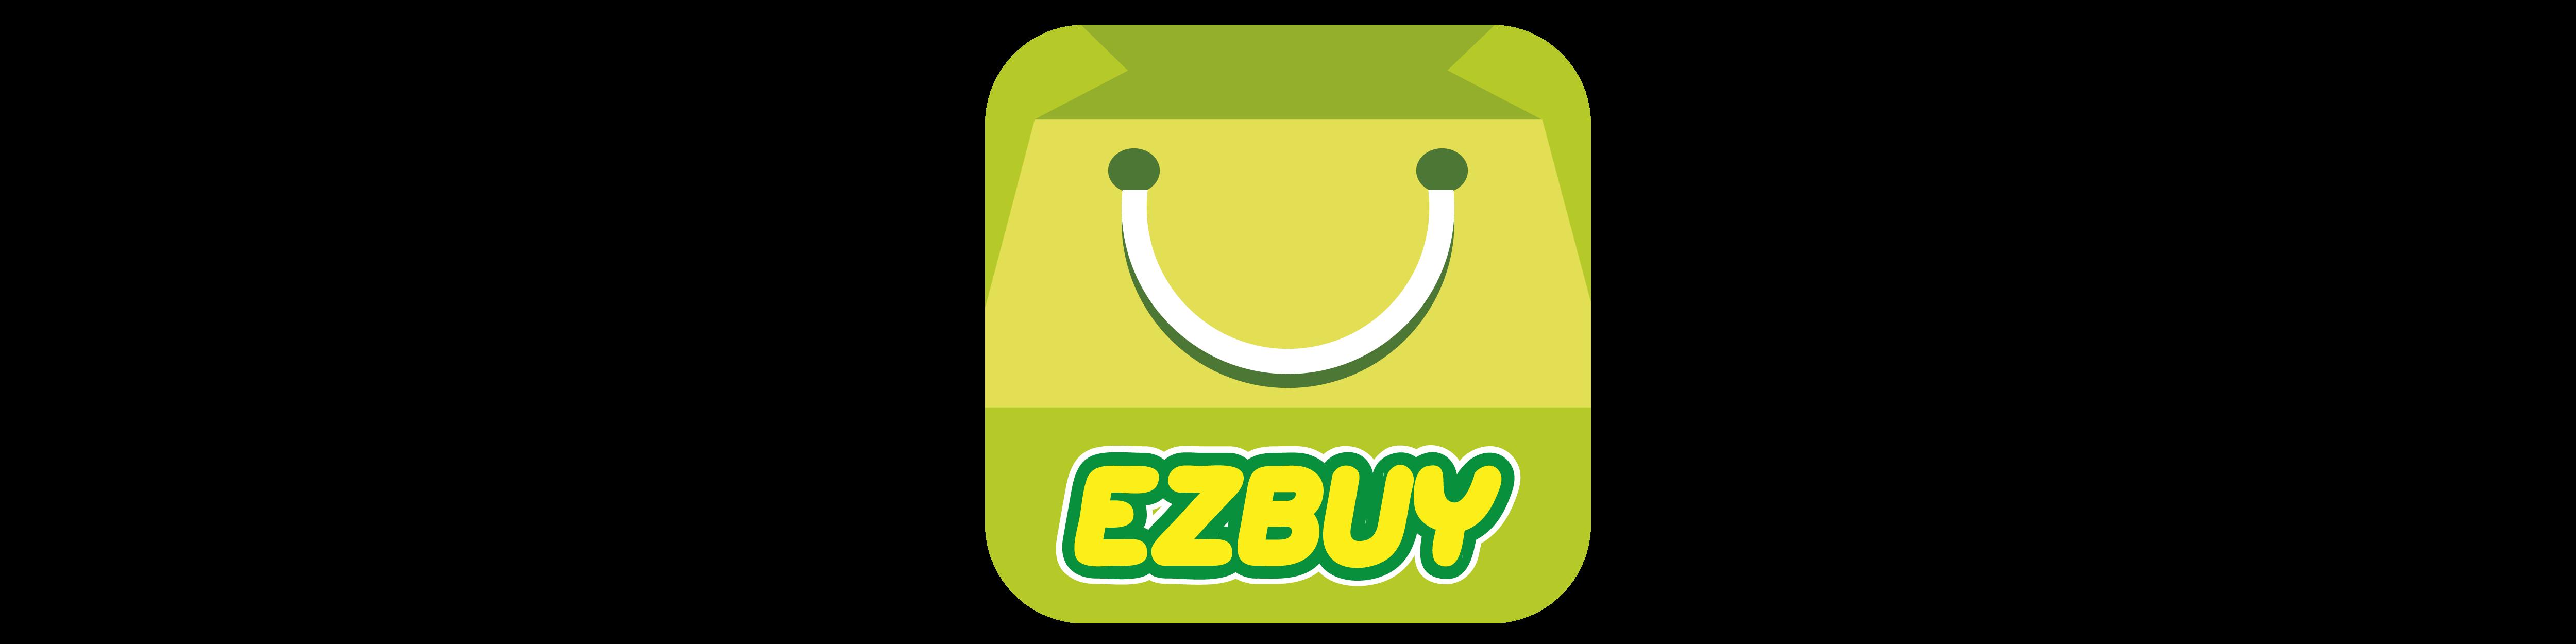 易集買 Ezbuy